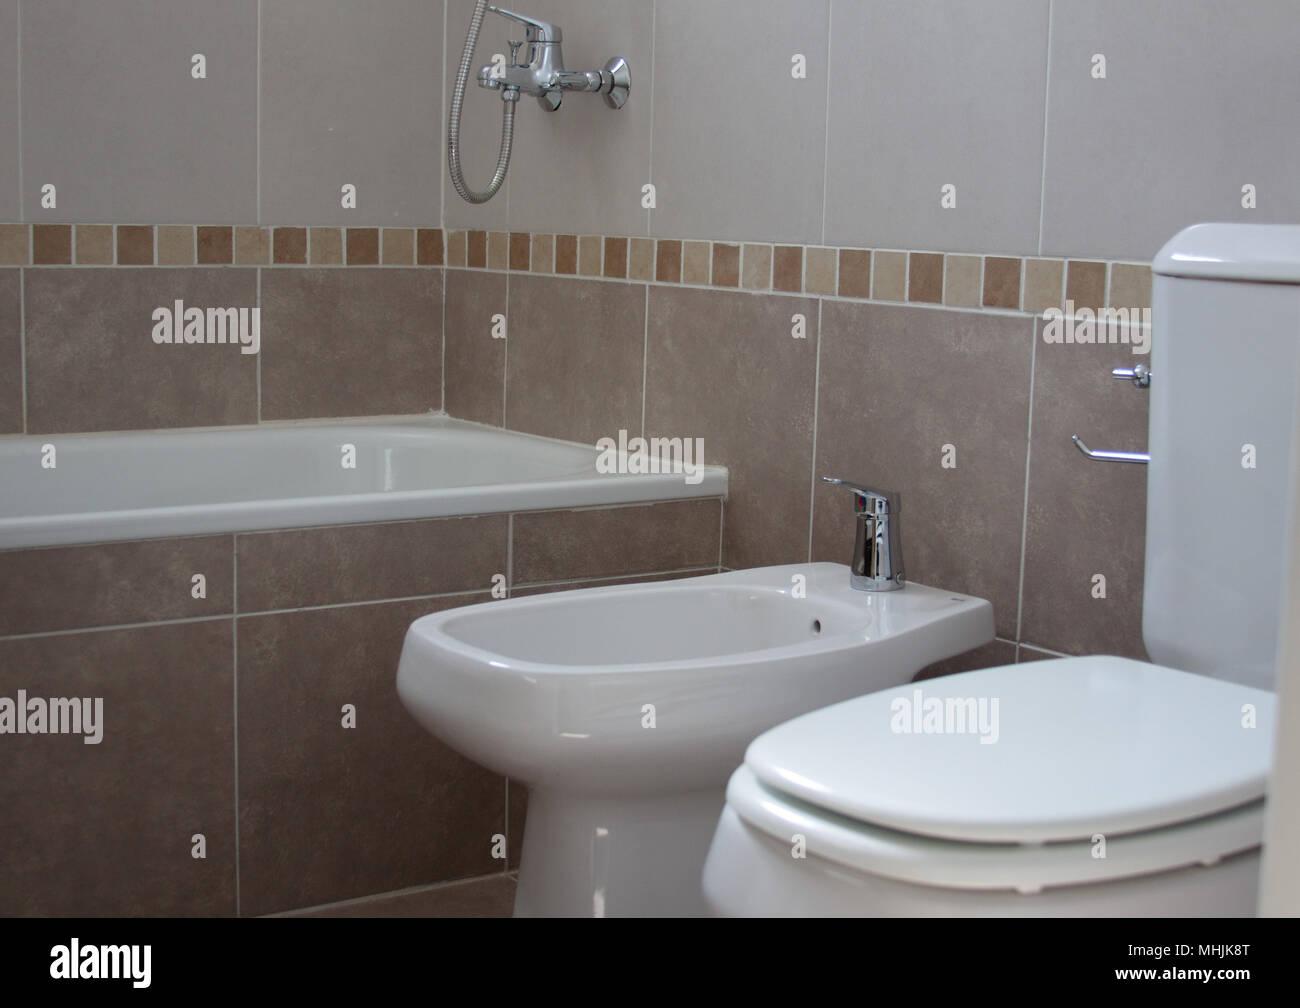 Badezimmer, WC Stockfoto, Bild: 182963112 - Alamy